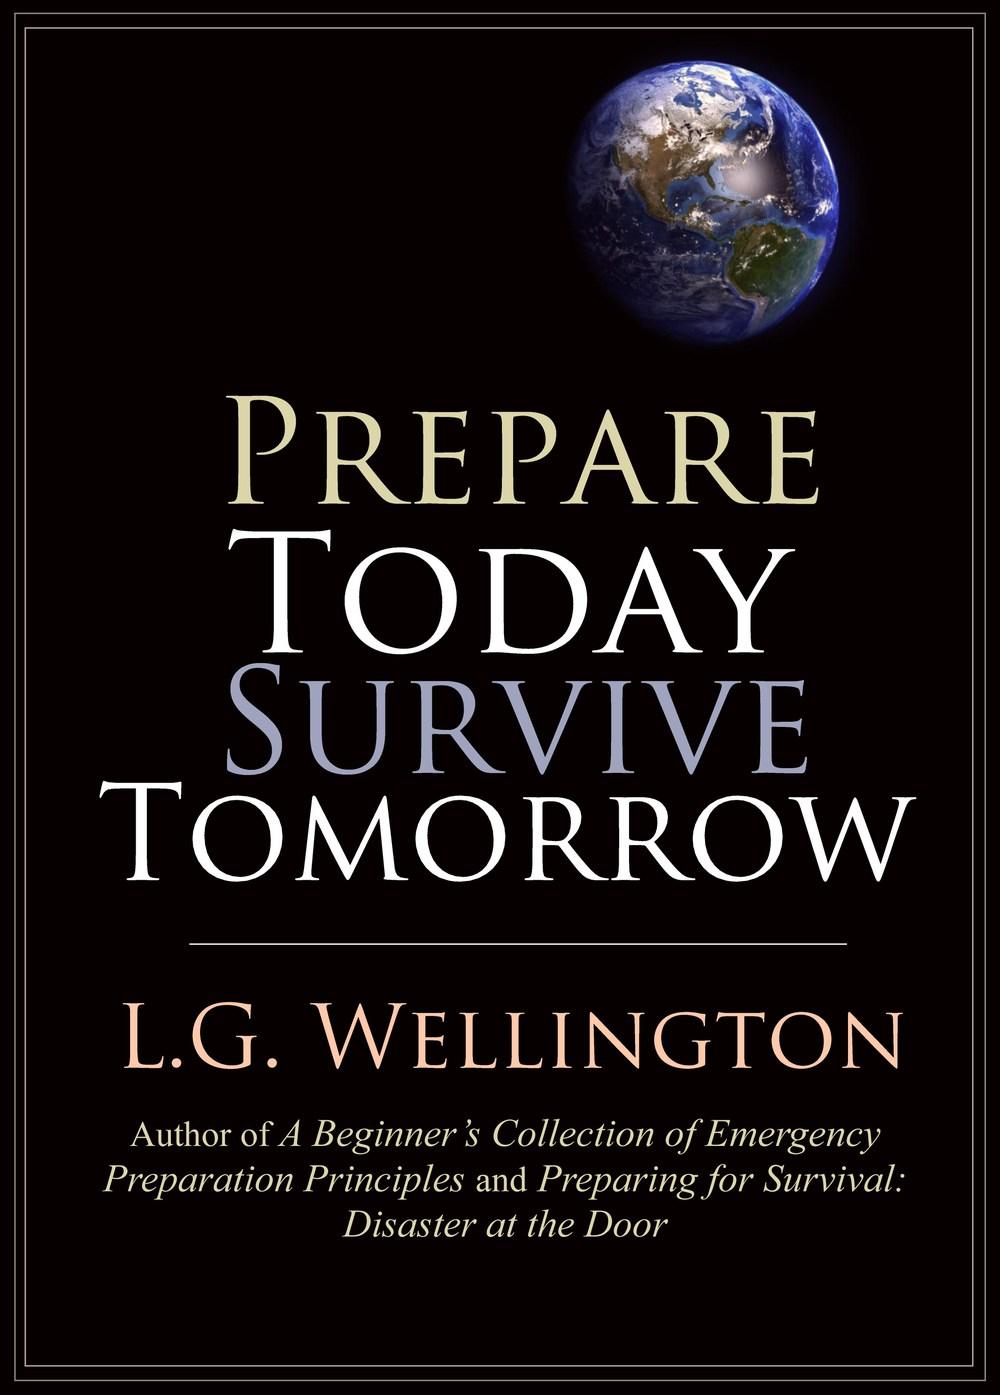 PrepareTodaySurviveTomorrow_Cover.jpg